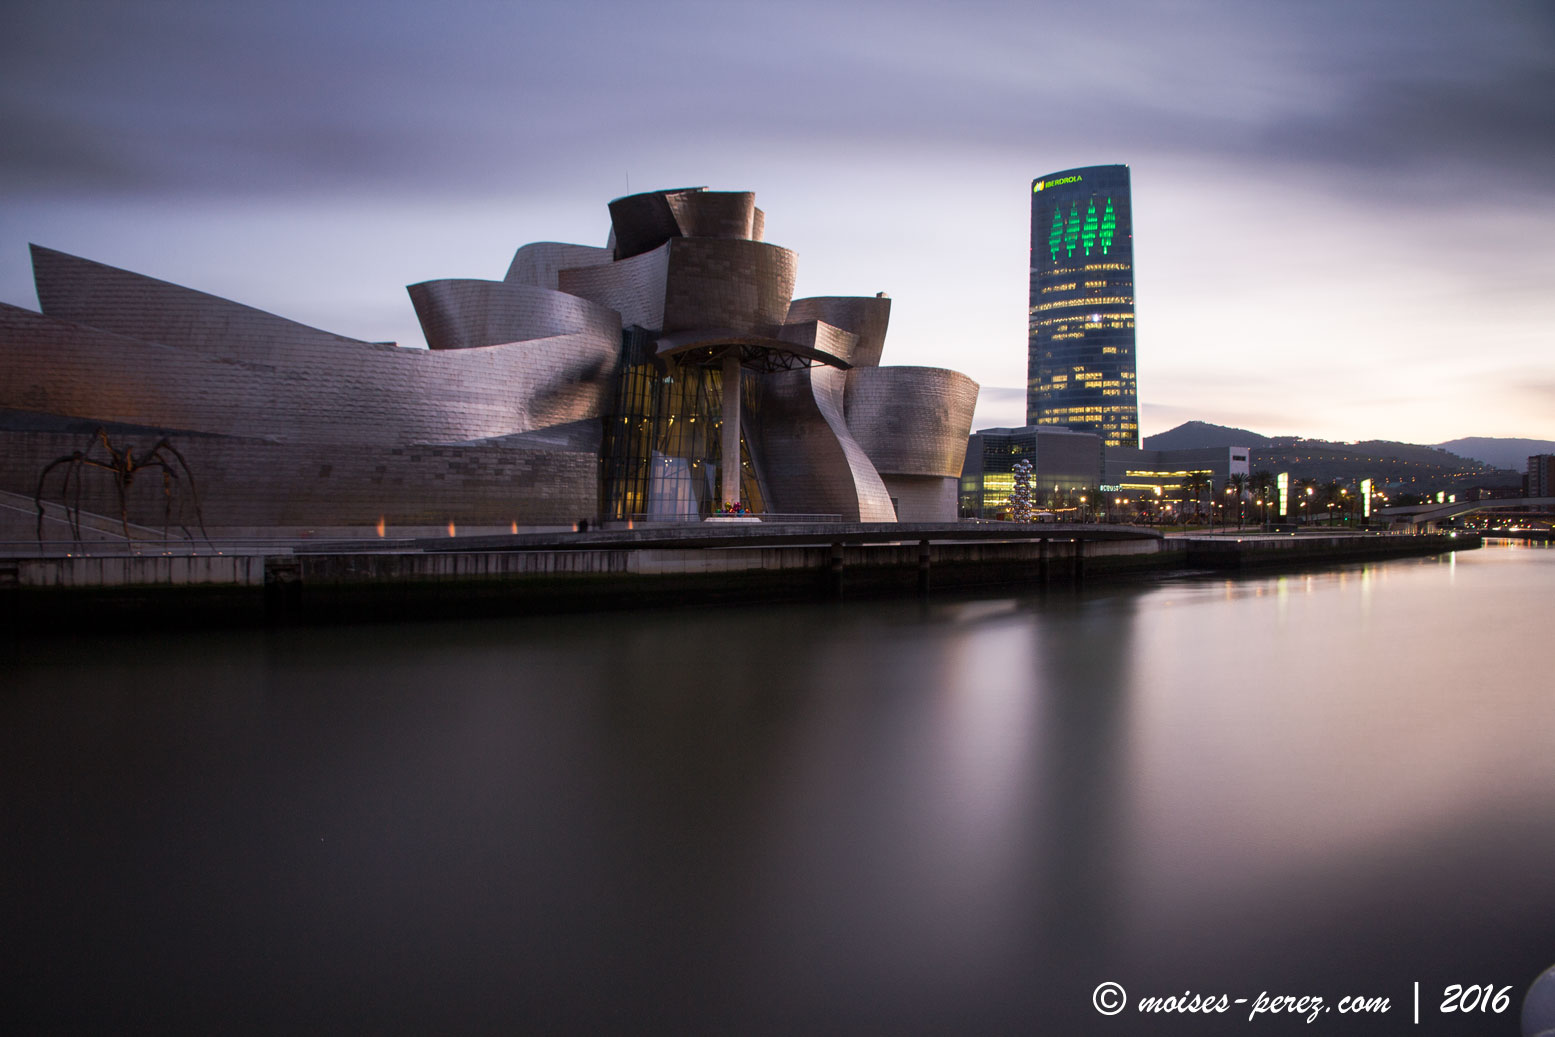 Museo Guggenheim in Bilbao